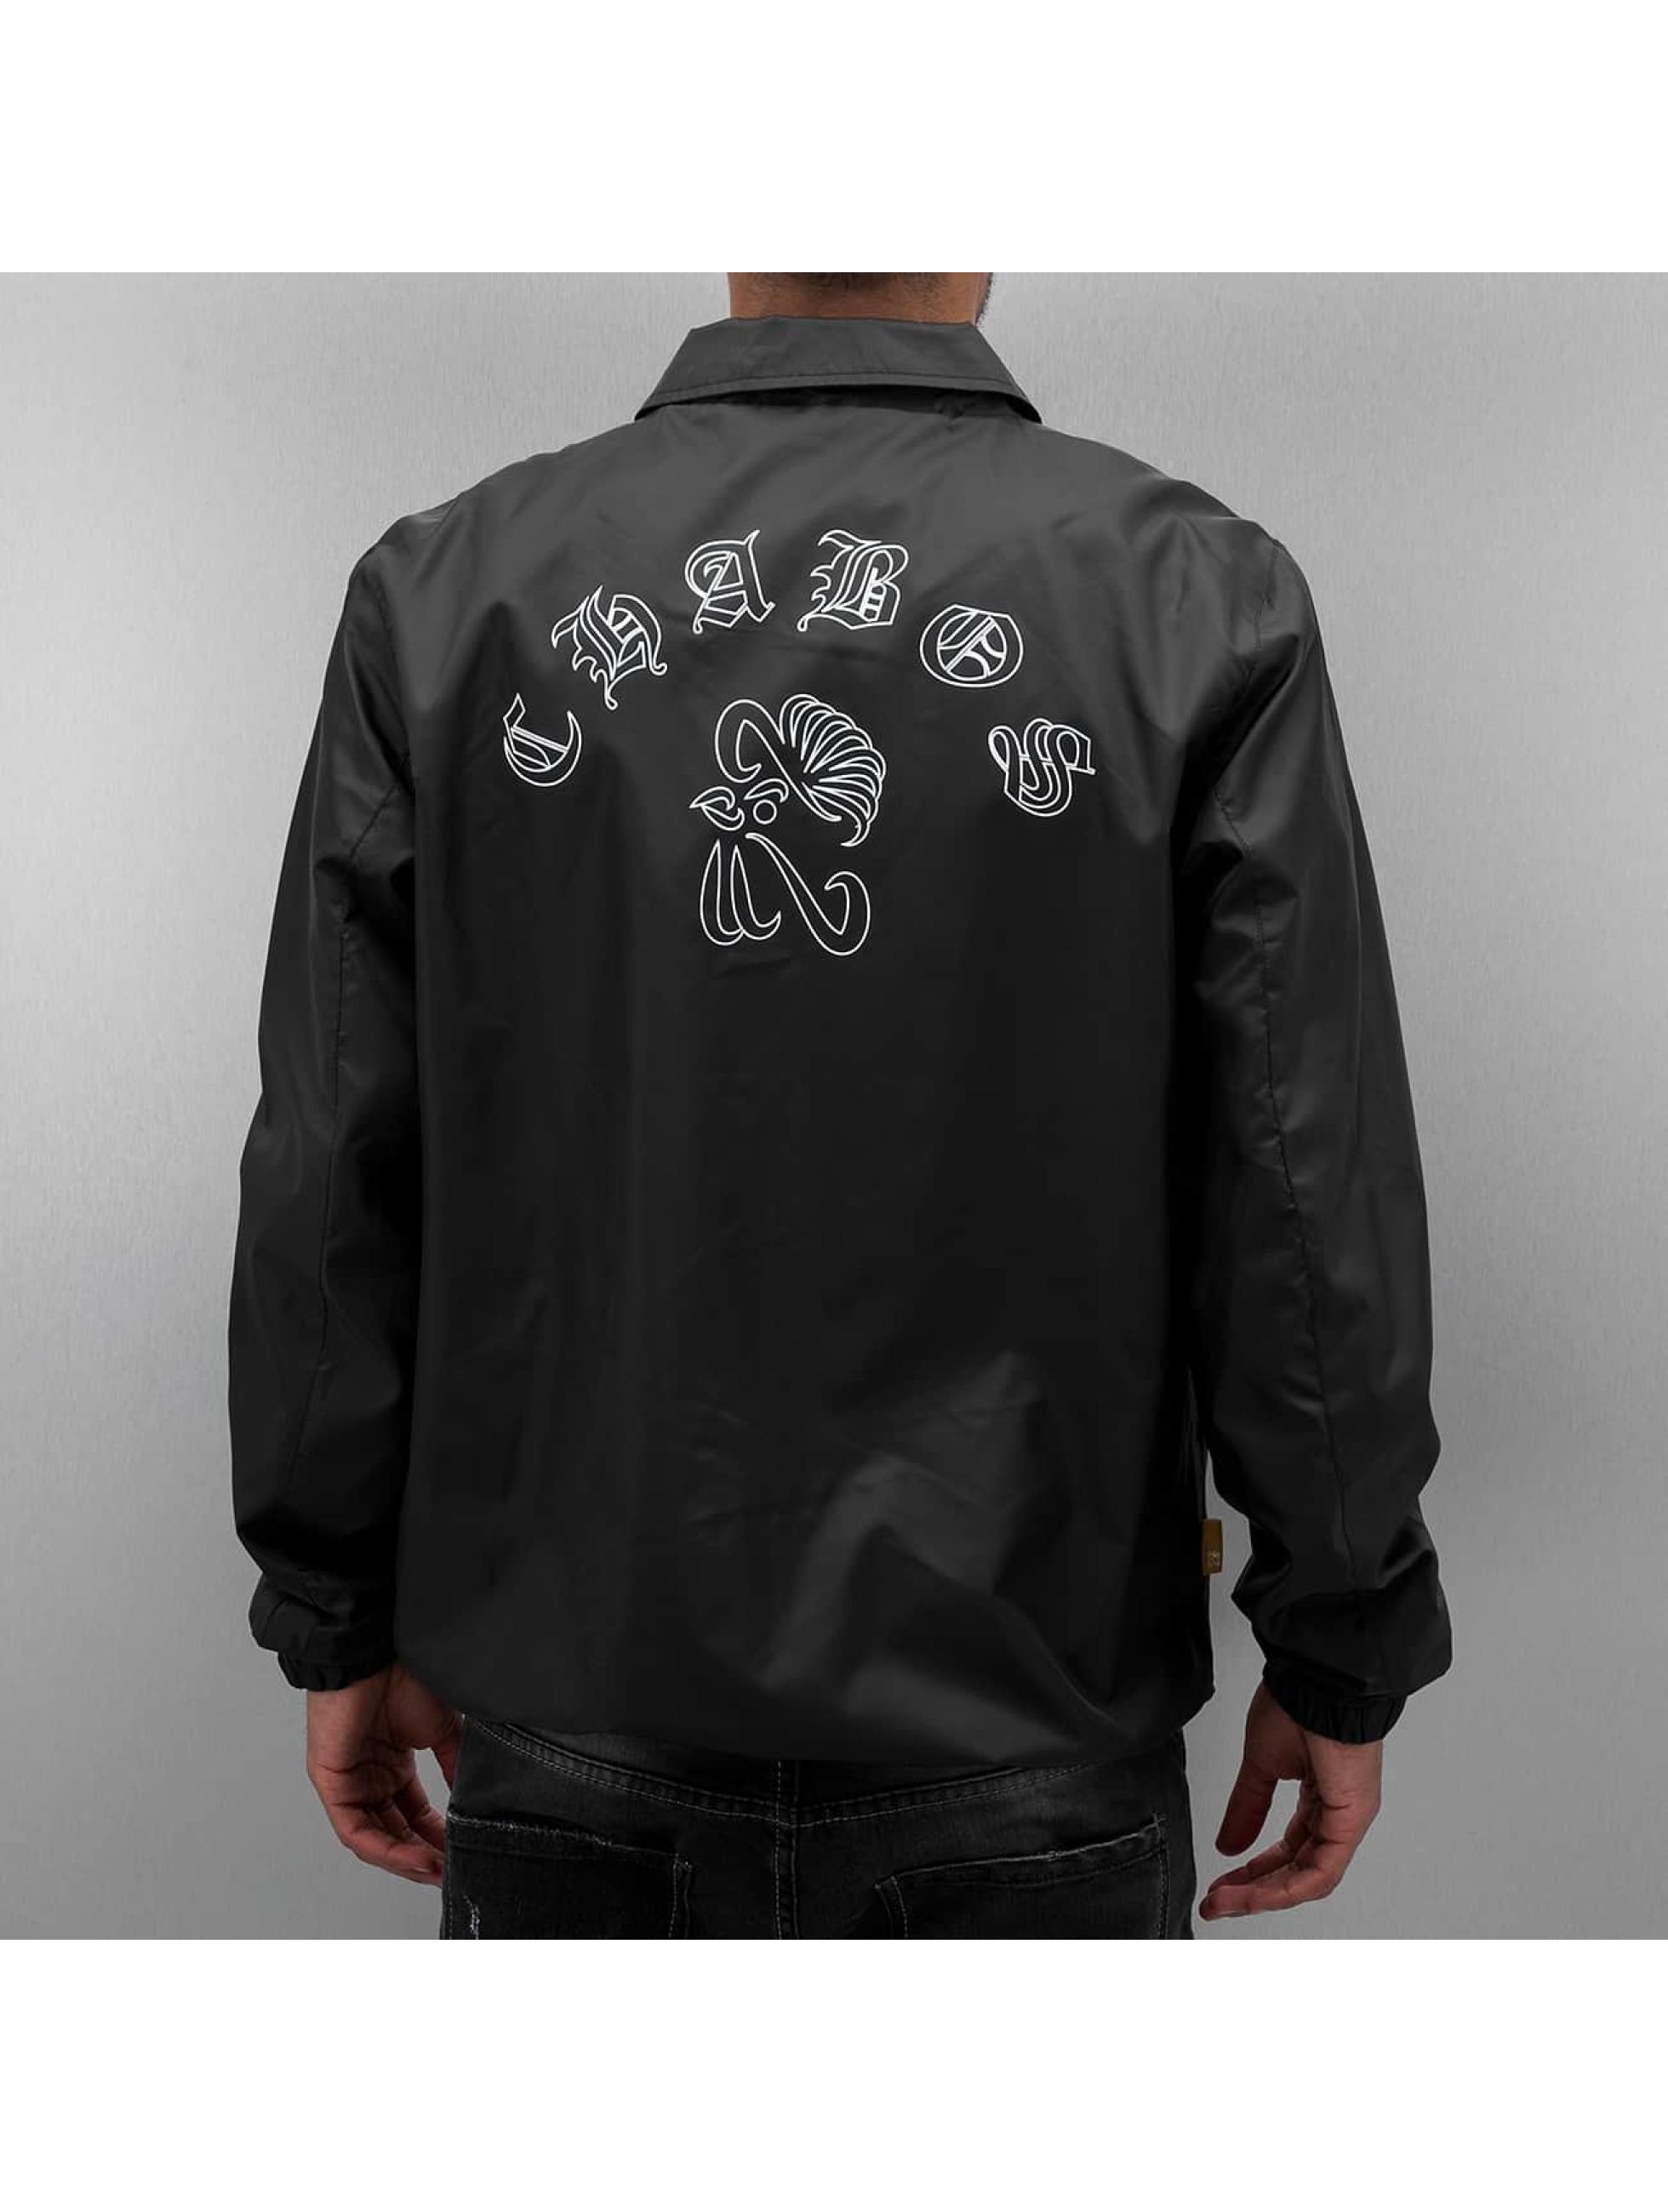 CHABOS IIVII Демисезонная куртка CBC Coach черный